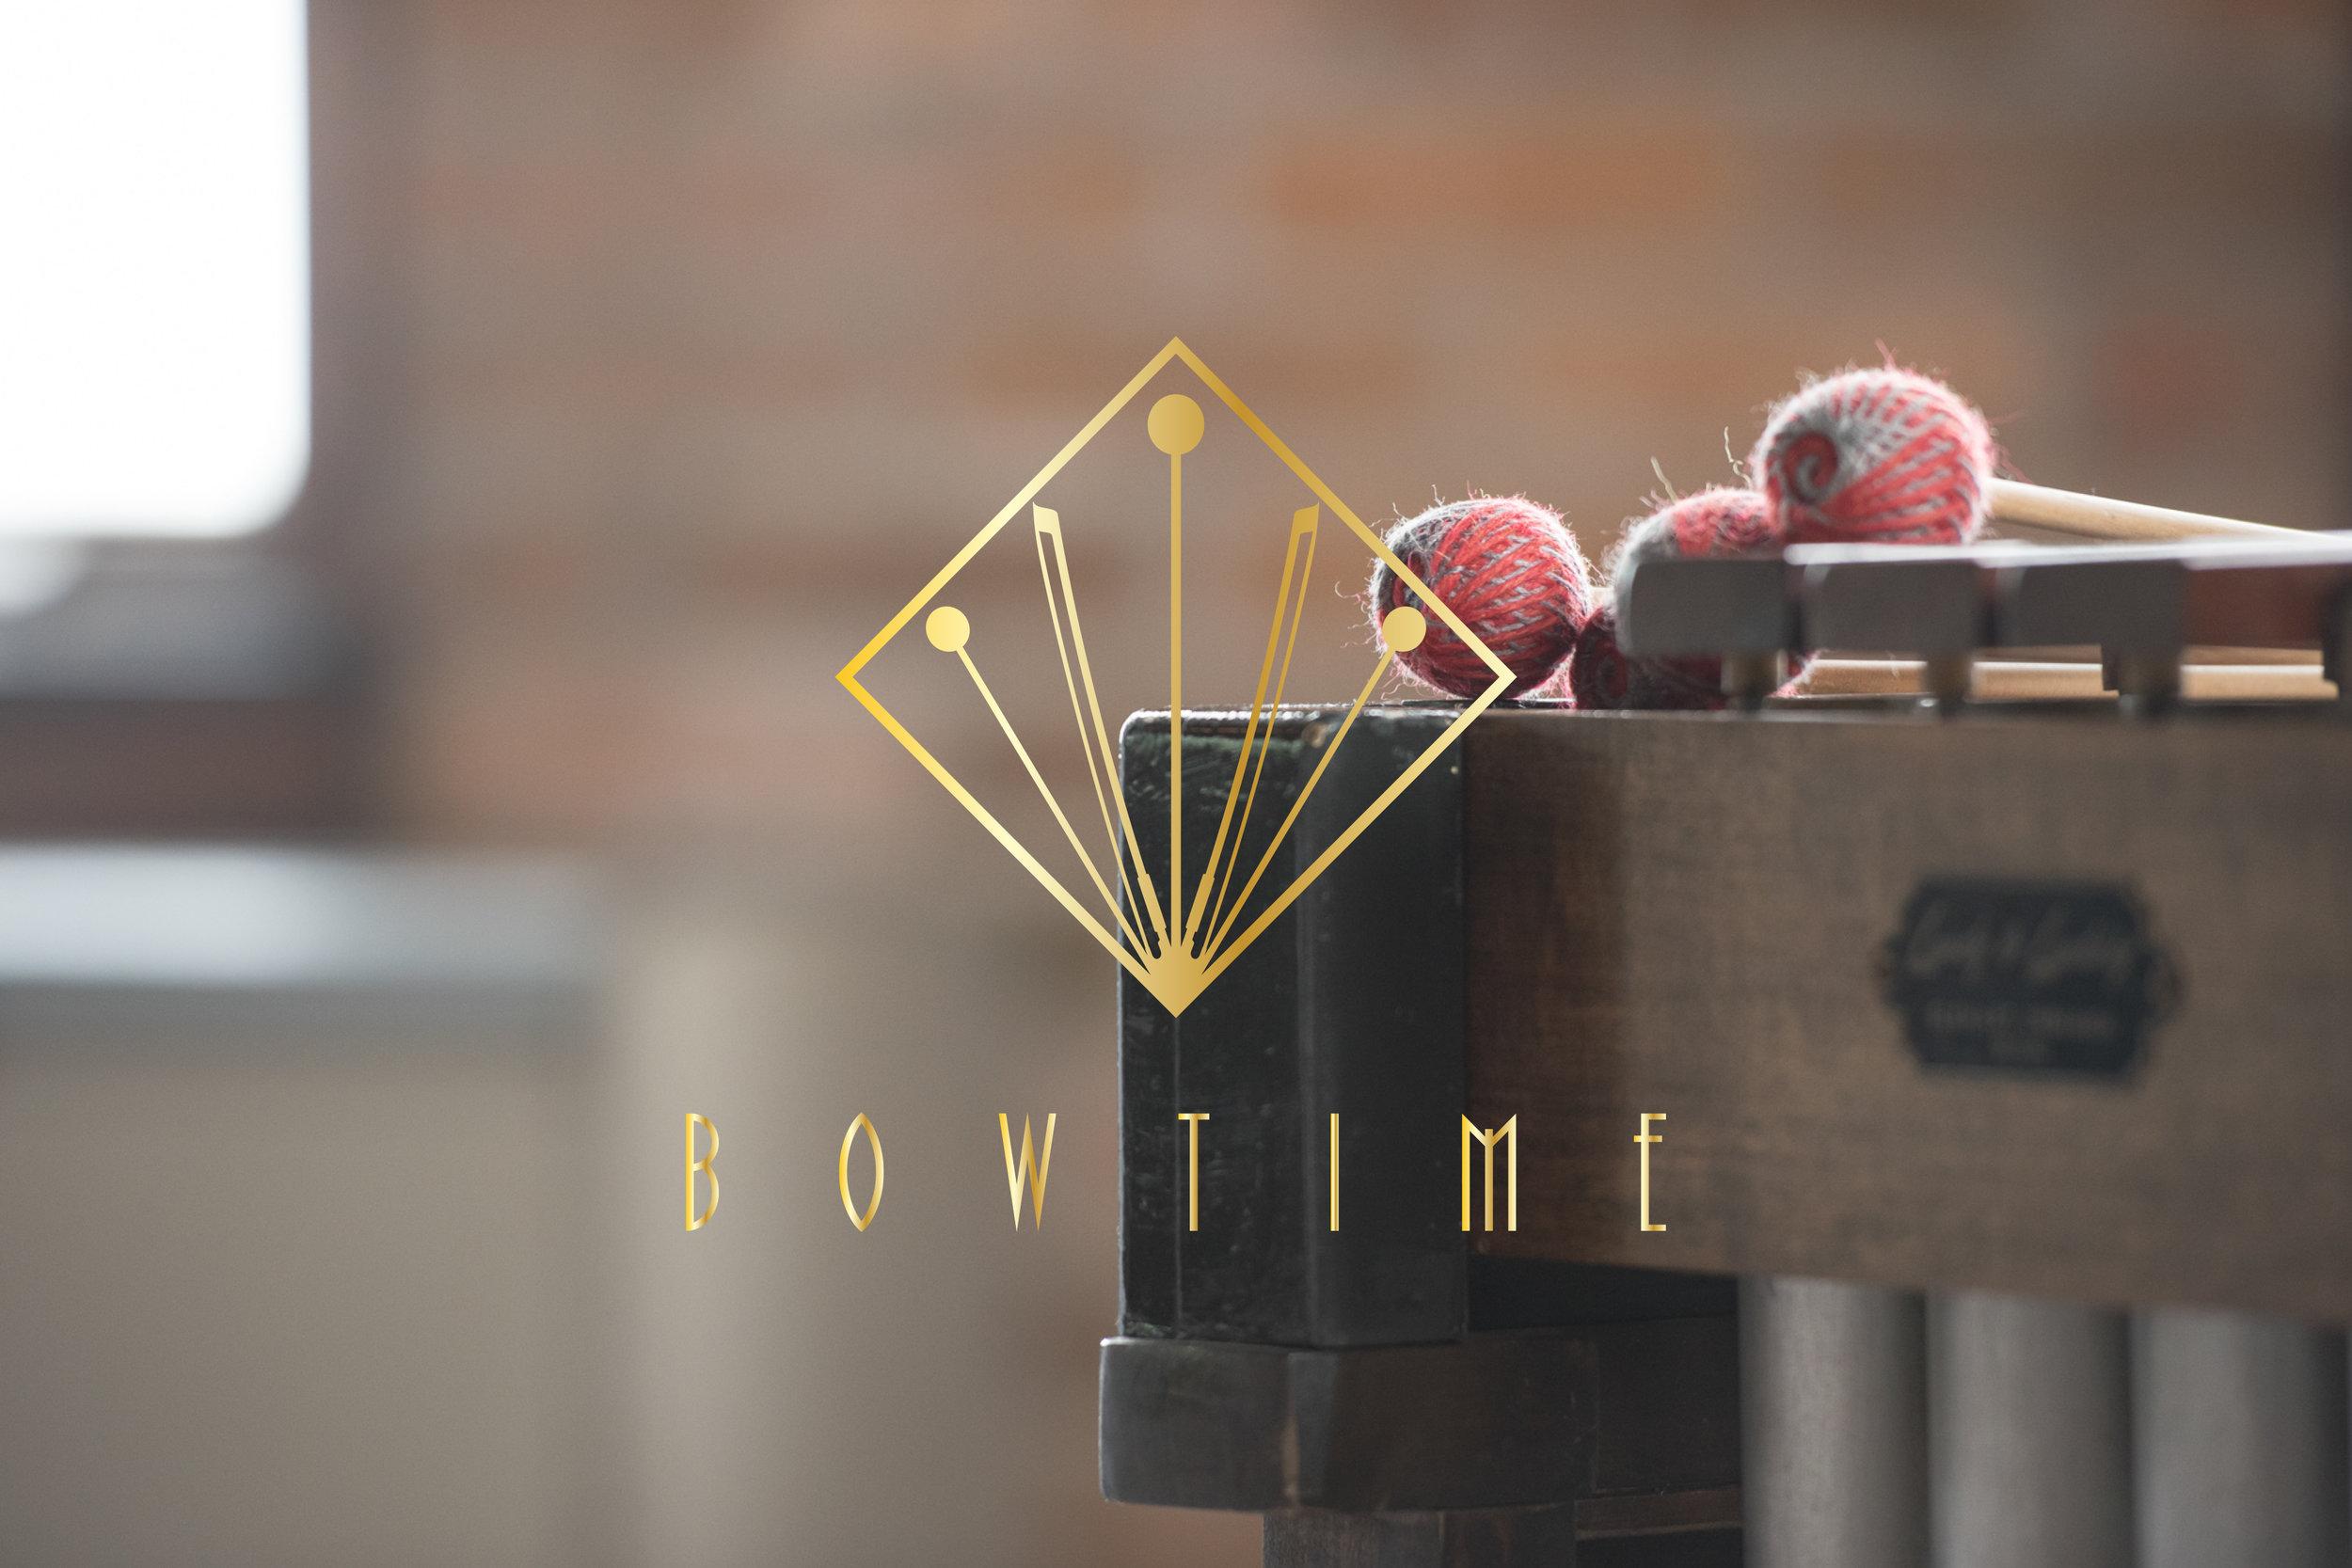 BOWTIME PIX 12X8 w logo 5in-6.jpg